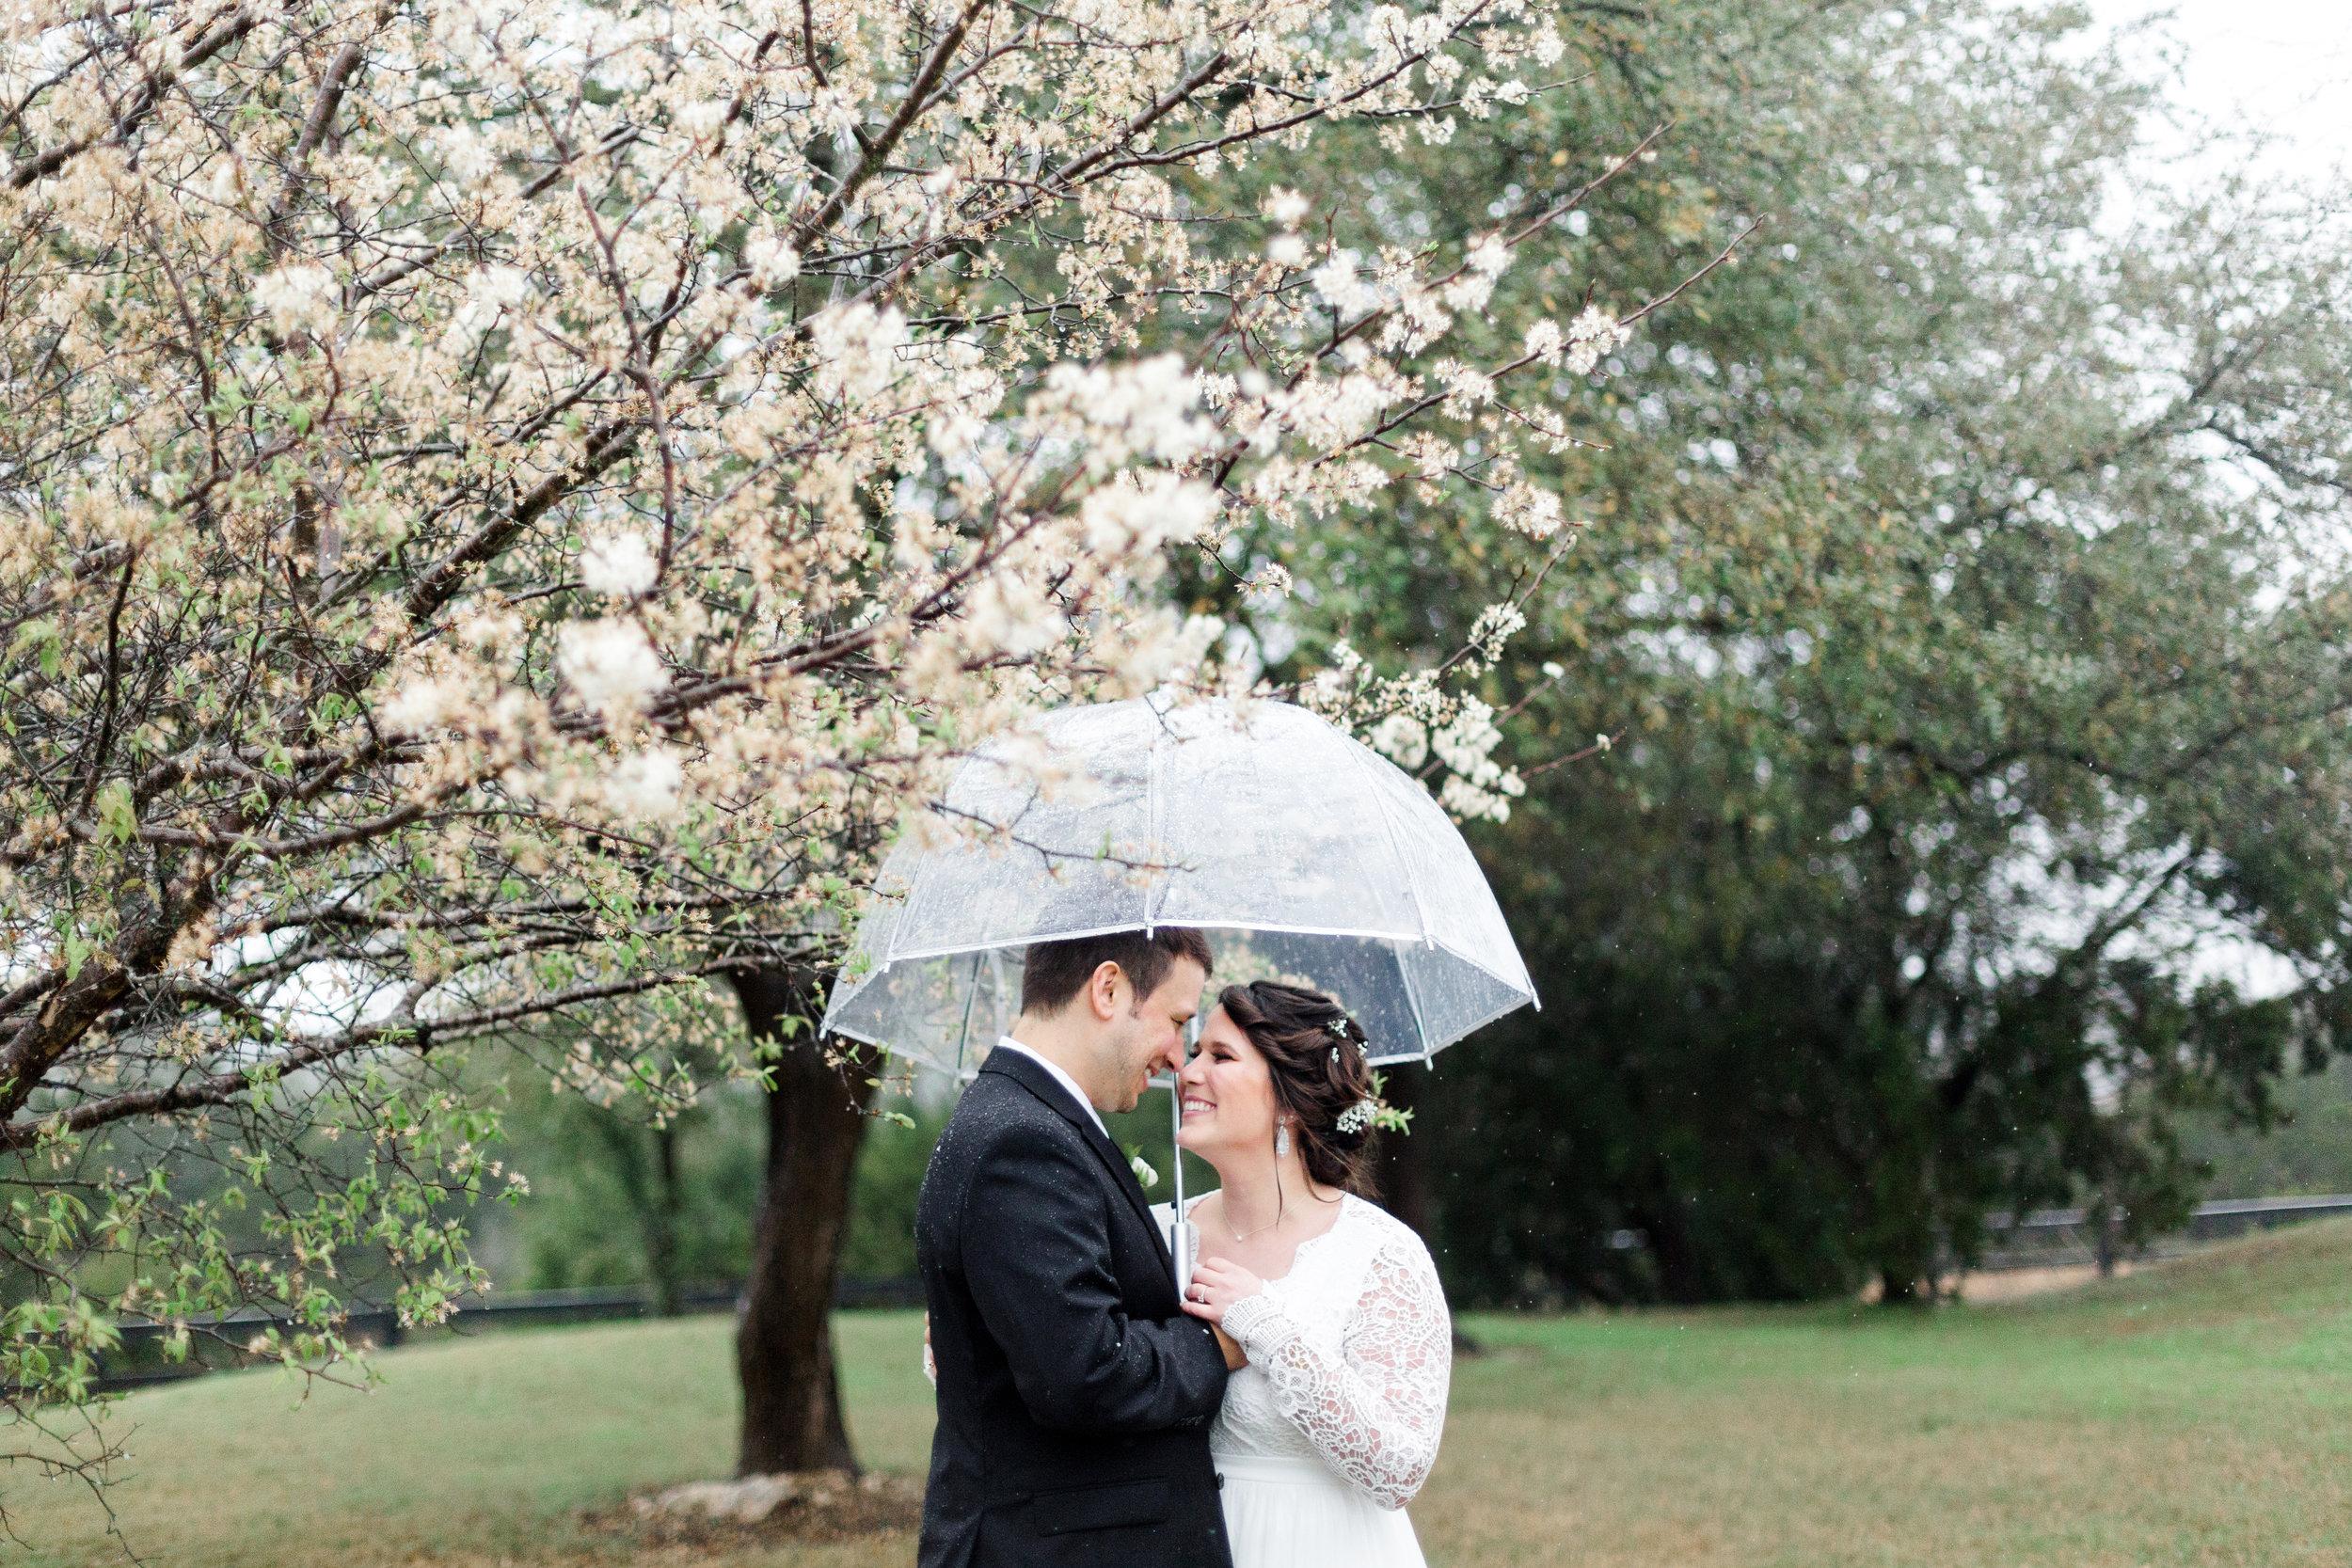 Austin_Texas_Fine_Art_Wedding_Photographer_Kayla_Snell_Photography_Antebellum_Oaks239.jpg